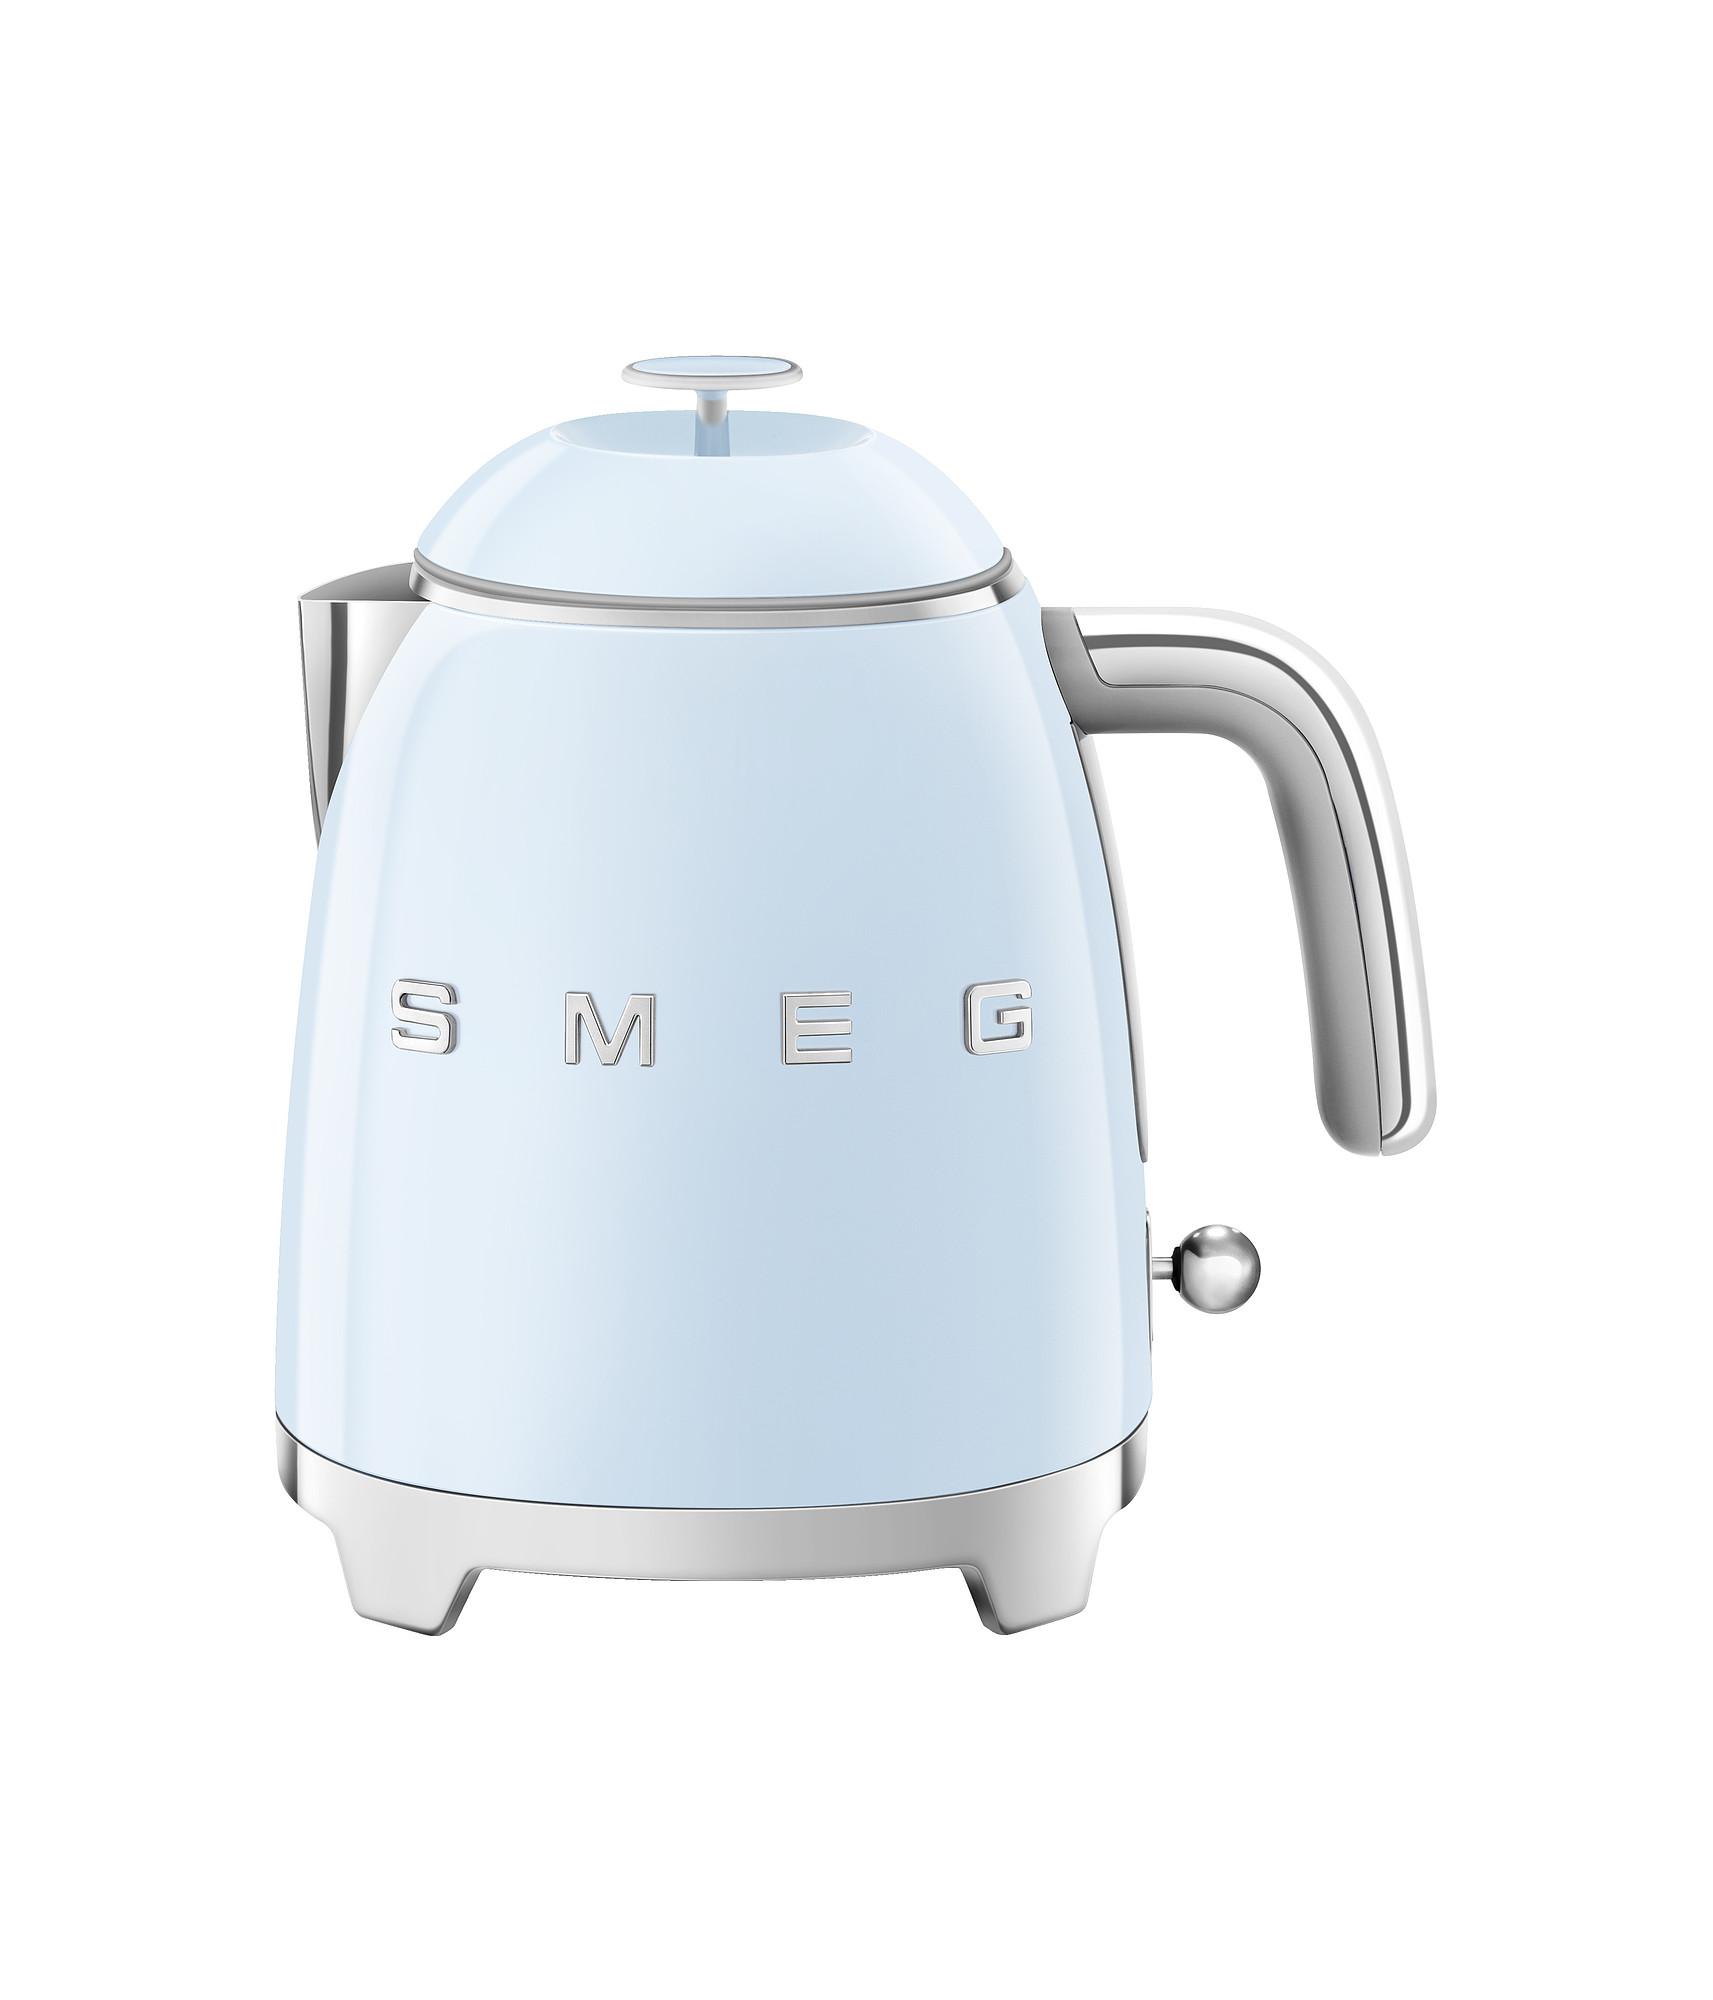 SMEG Mini Wasserkocher Pastellblau